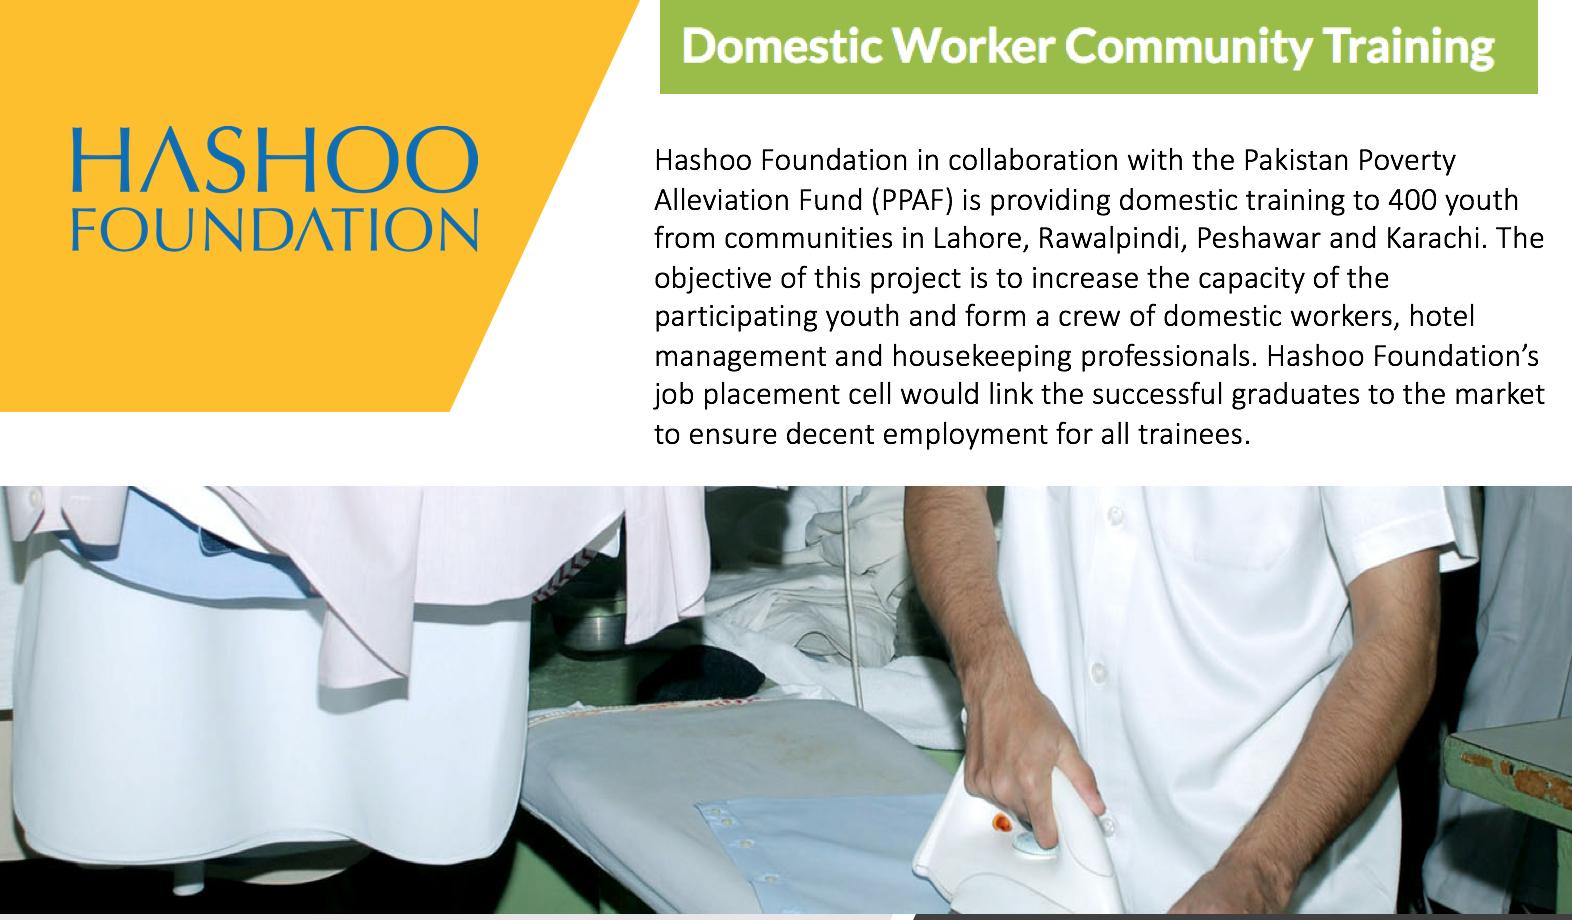 Hashoo Foundation USA: March 2017